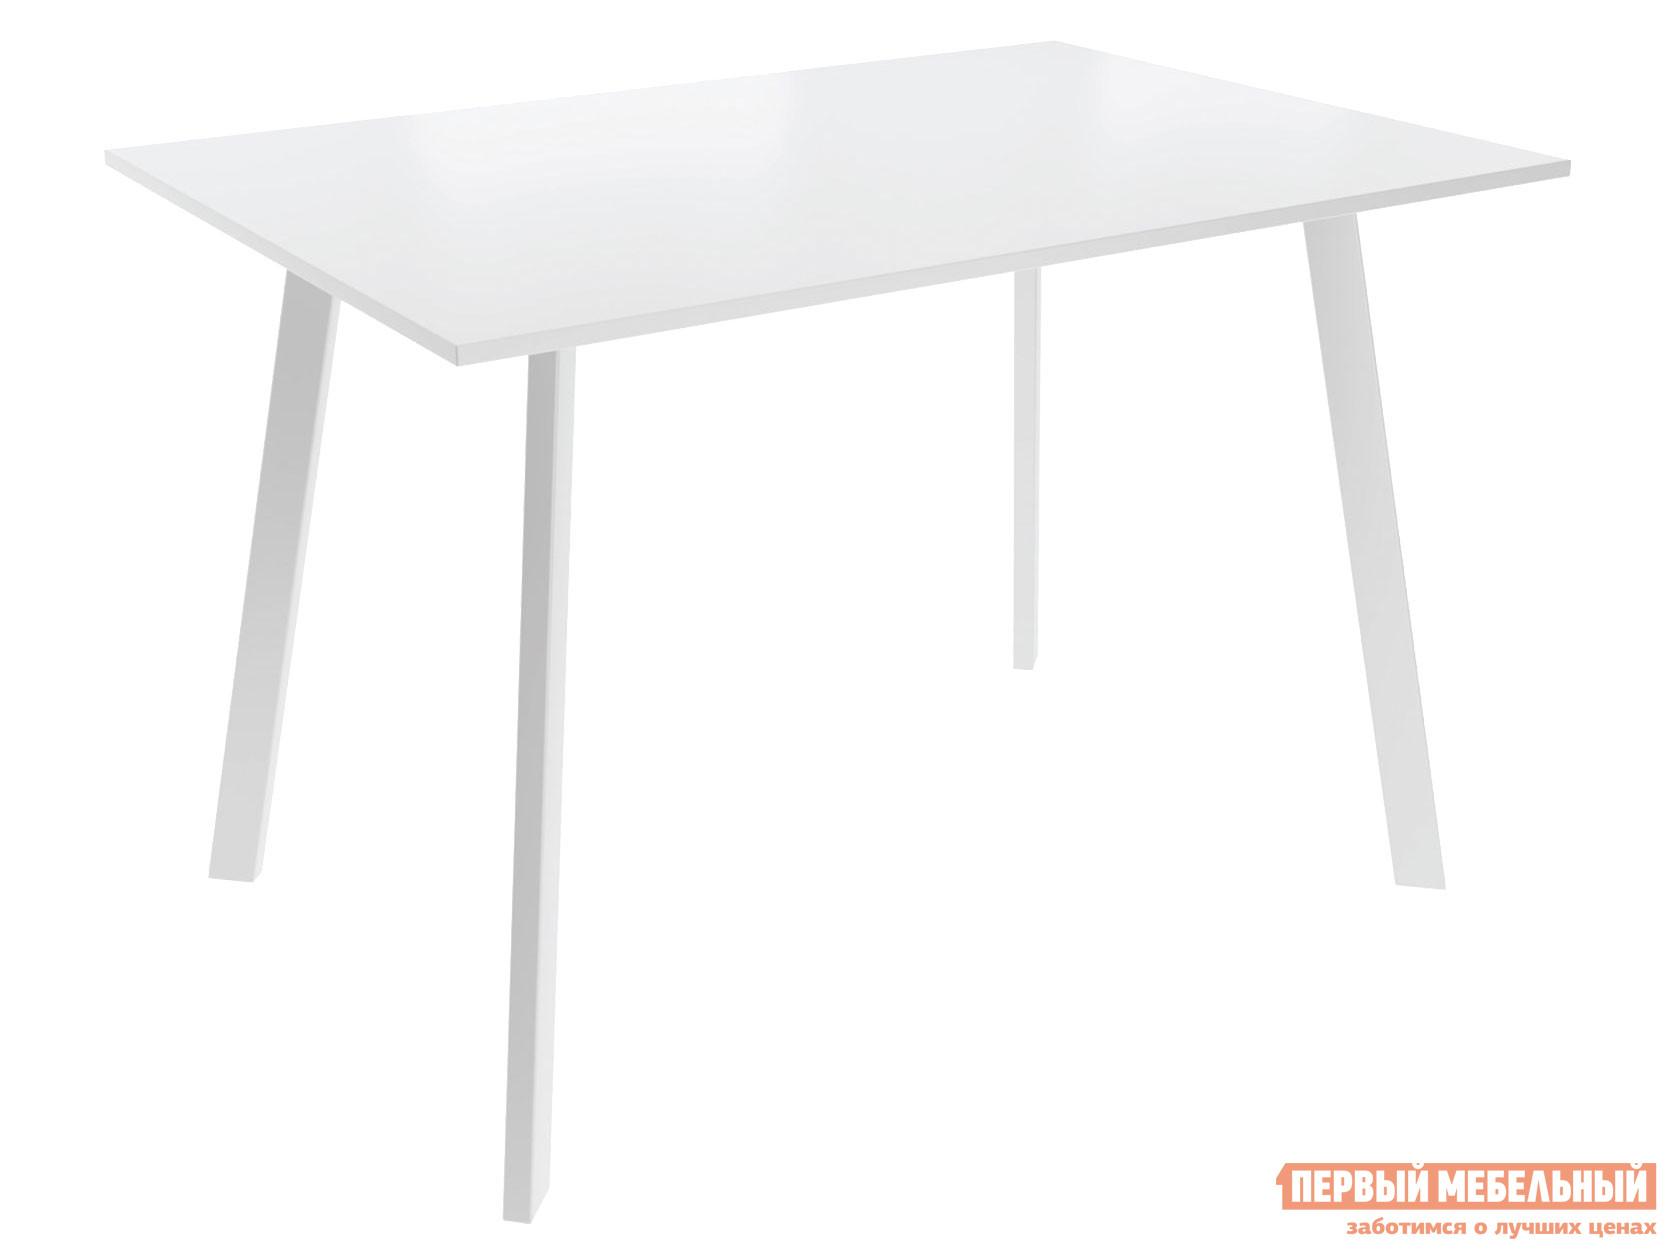 Кухонный стол  Слим 2 Белый / Белый, металл Листвиг 127336